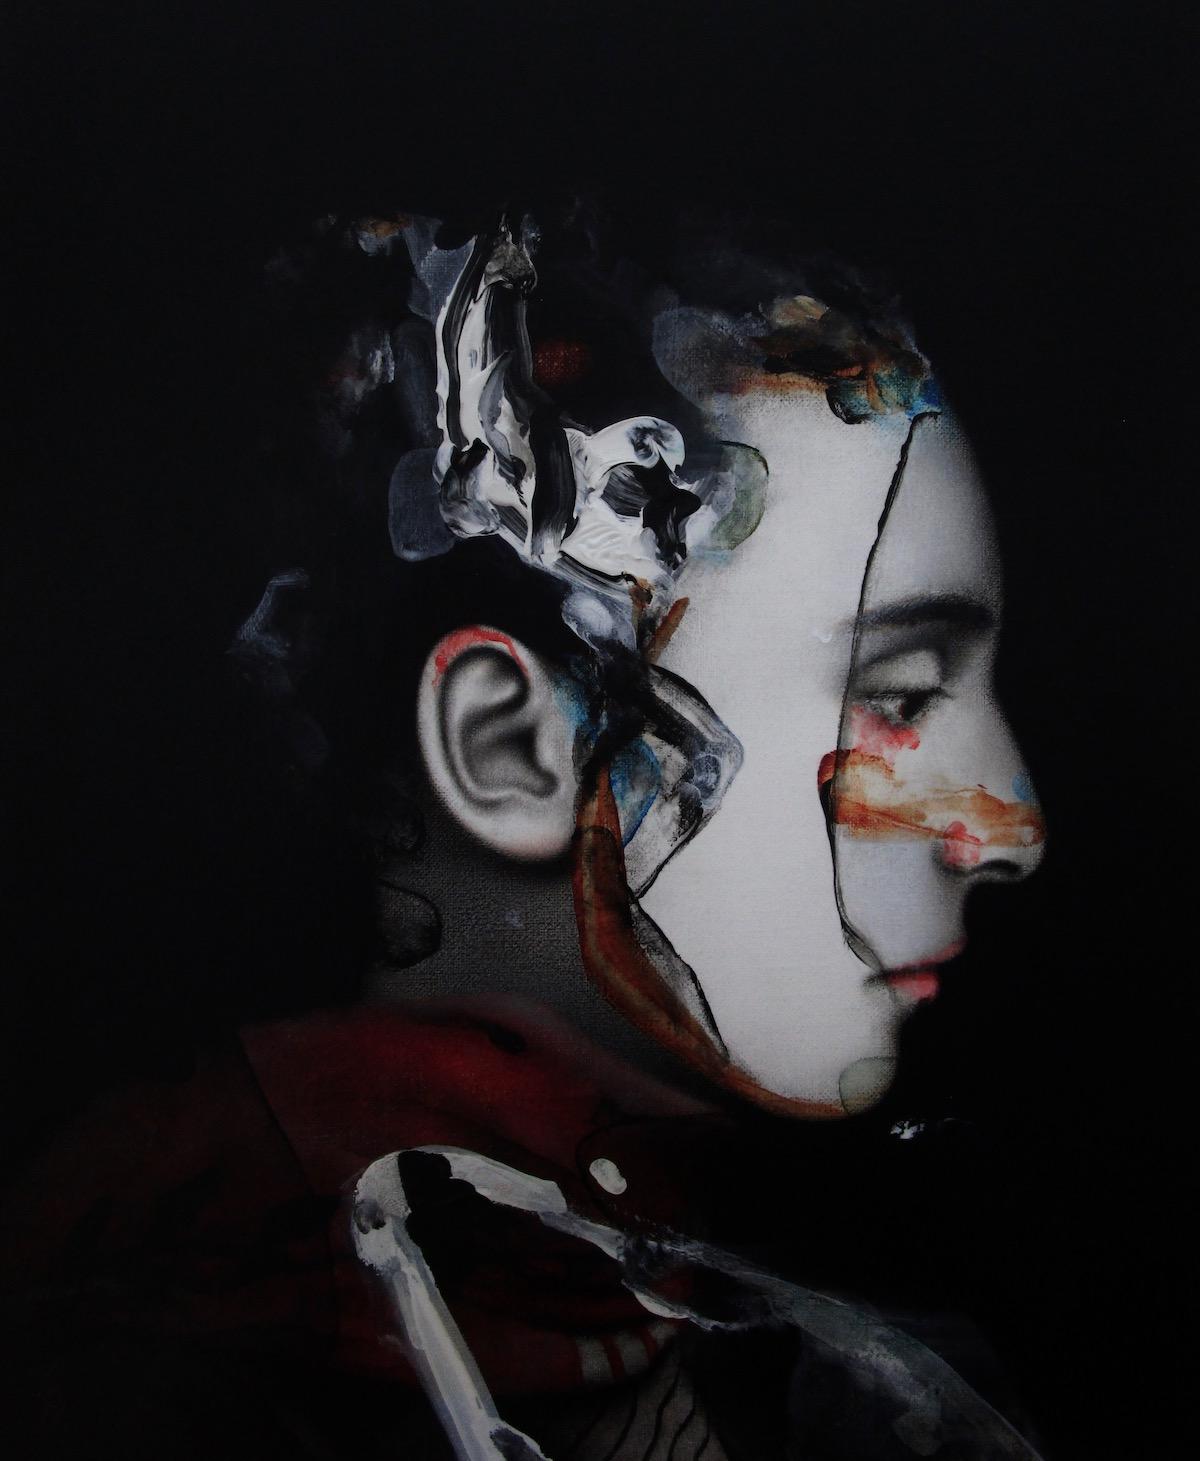 antoine cordet canvas toile peinture painting portrait art artist artiste peintre acrylic oil mineral water II